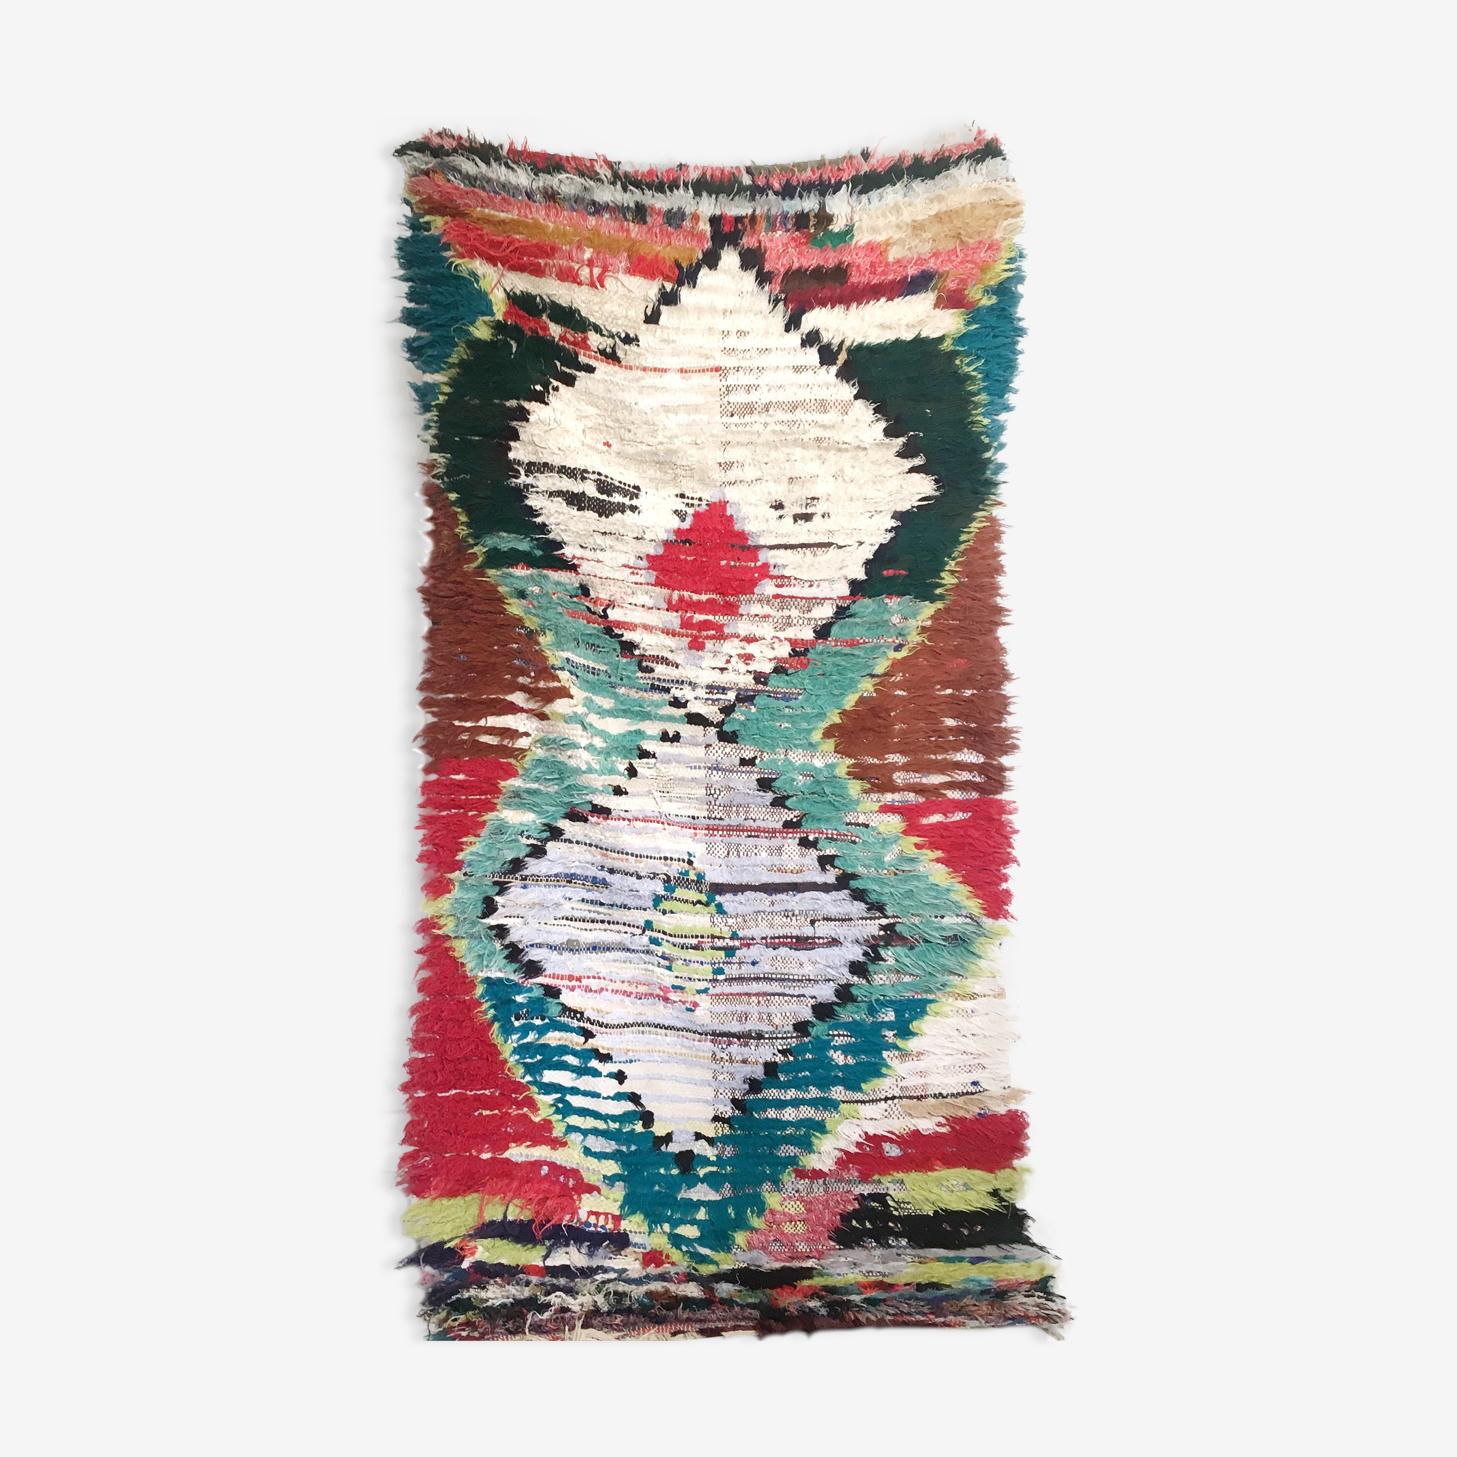 Tapis Berbere Azilal 90x192cm Laine Coton Multicolore Ethnique